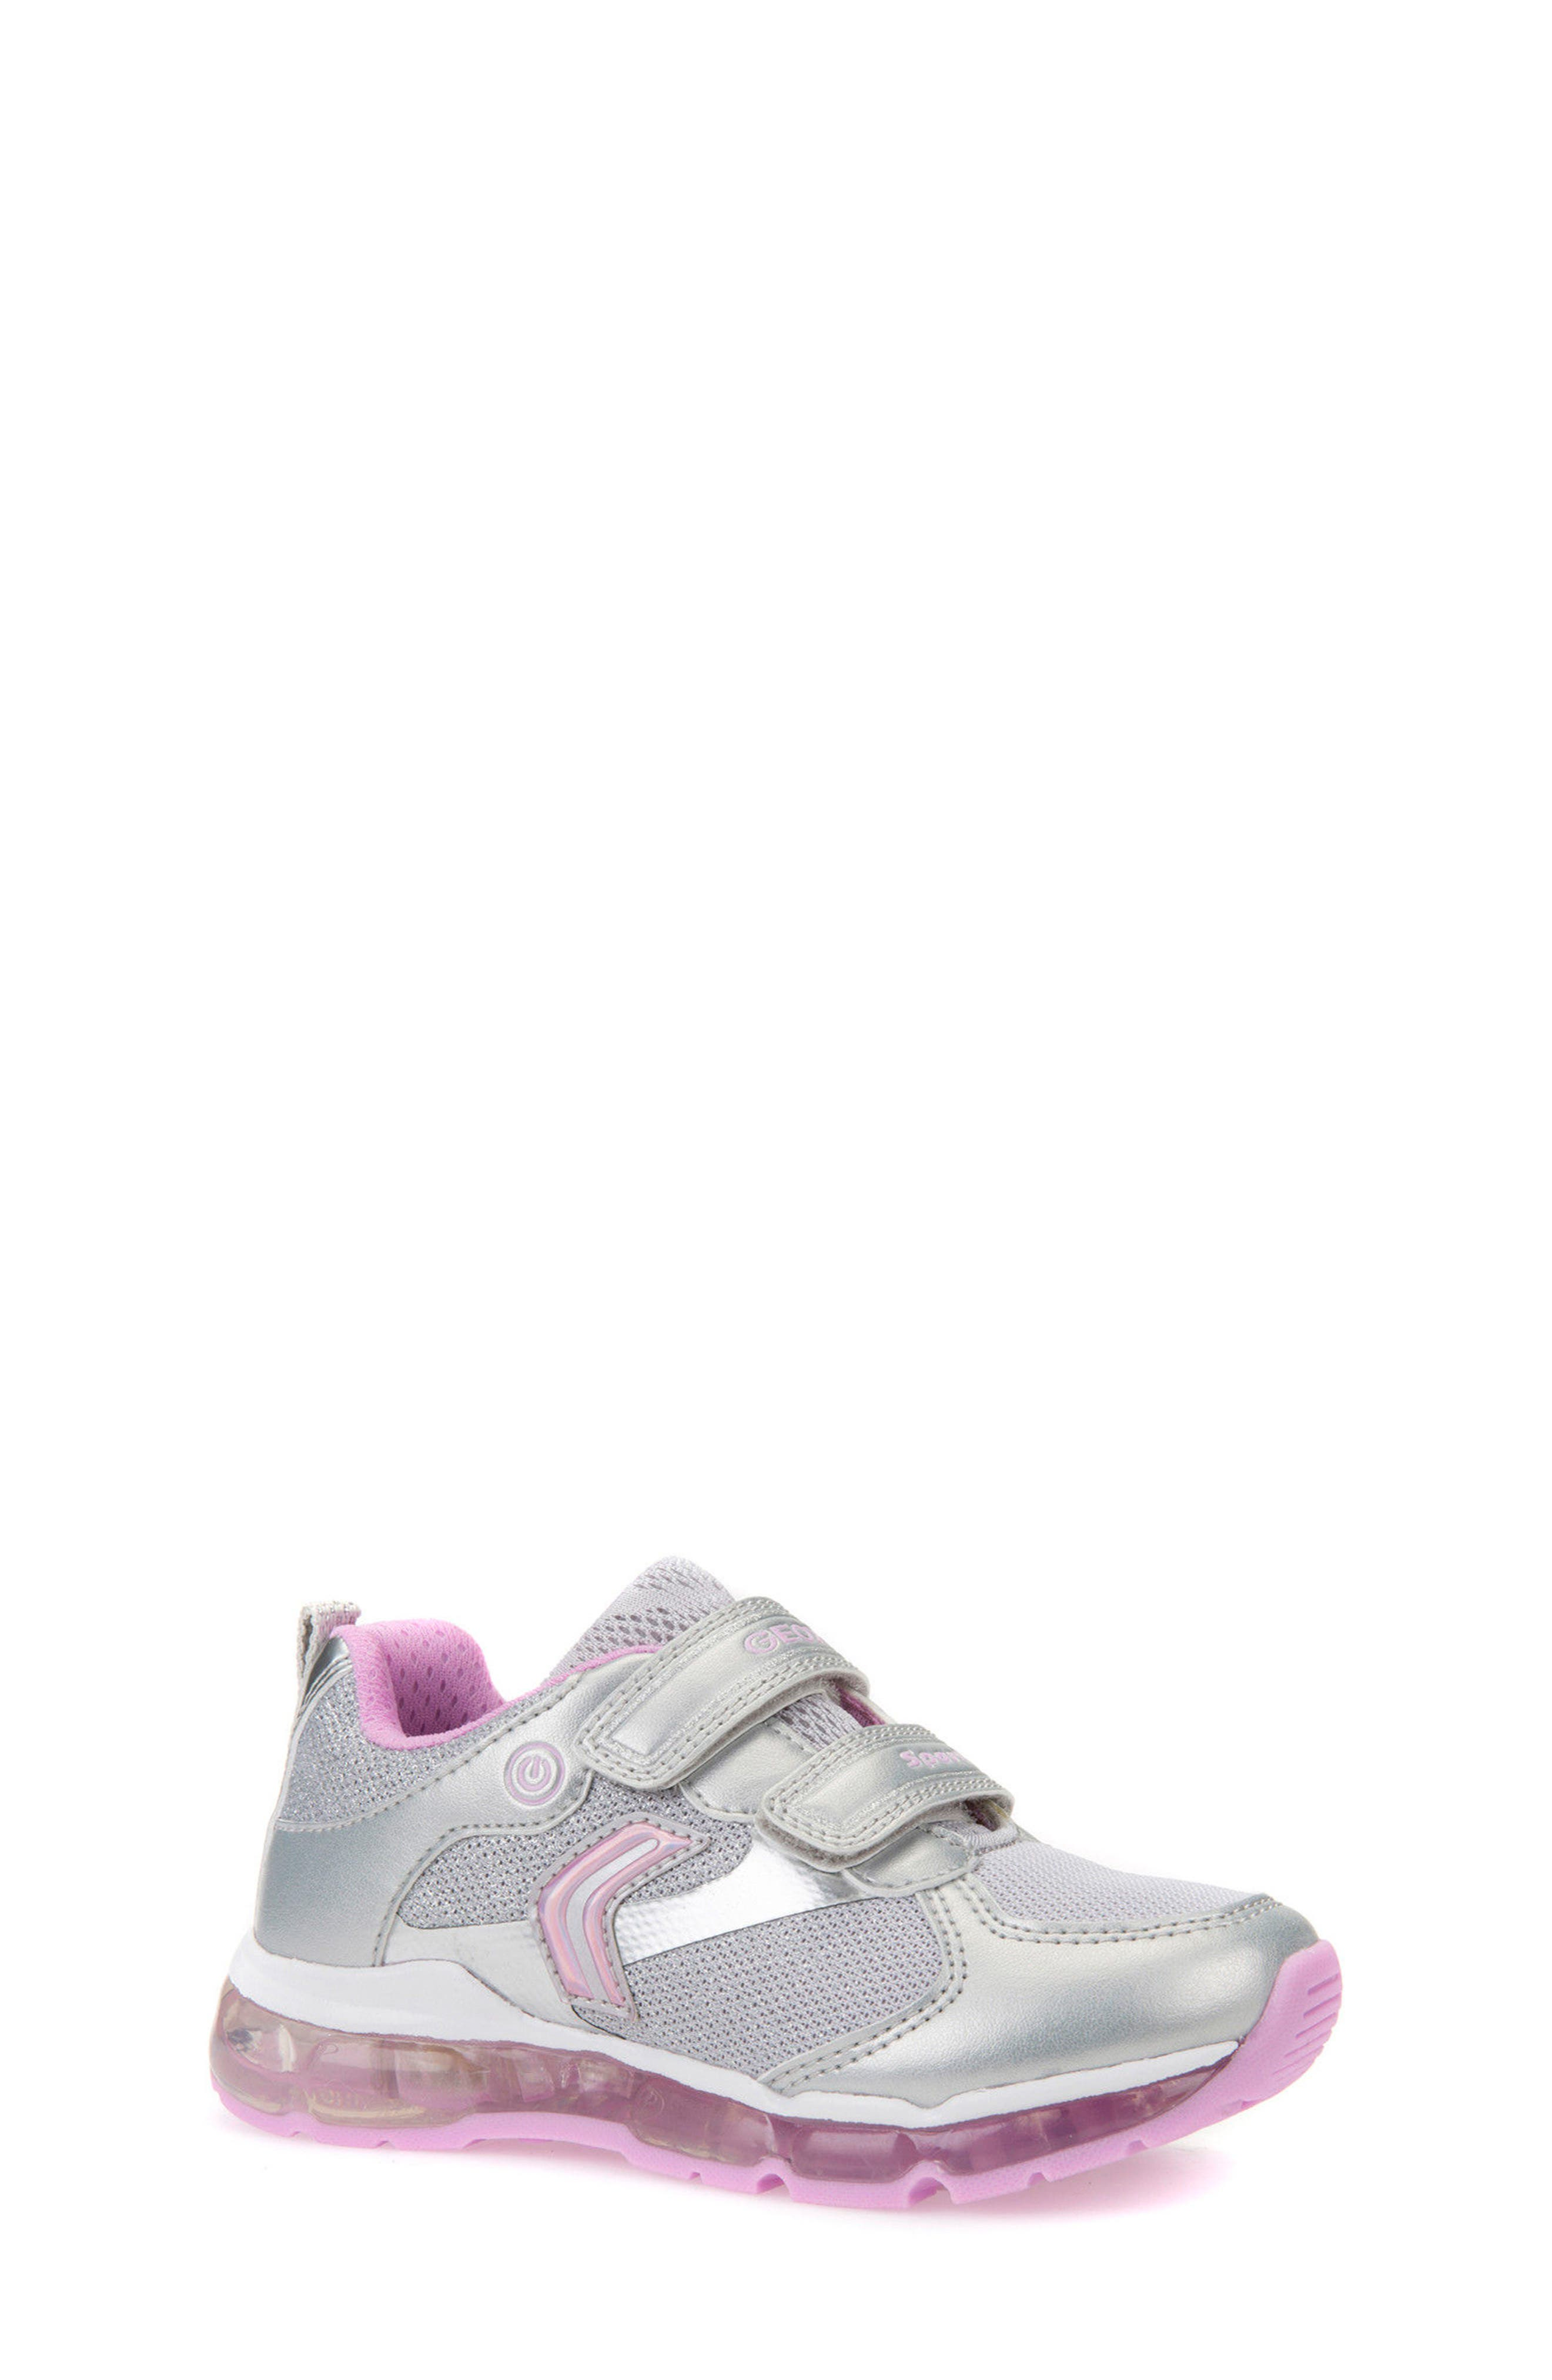 Girls Geox Android LightUp Sneaker Size 1US  32EU  Metallic